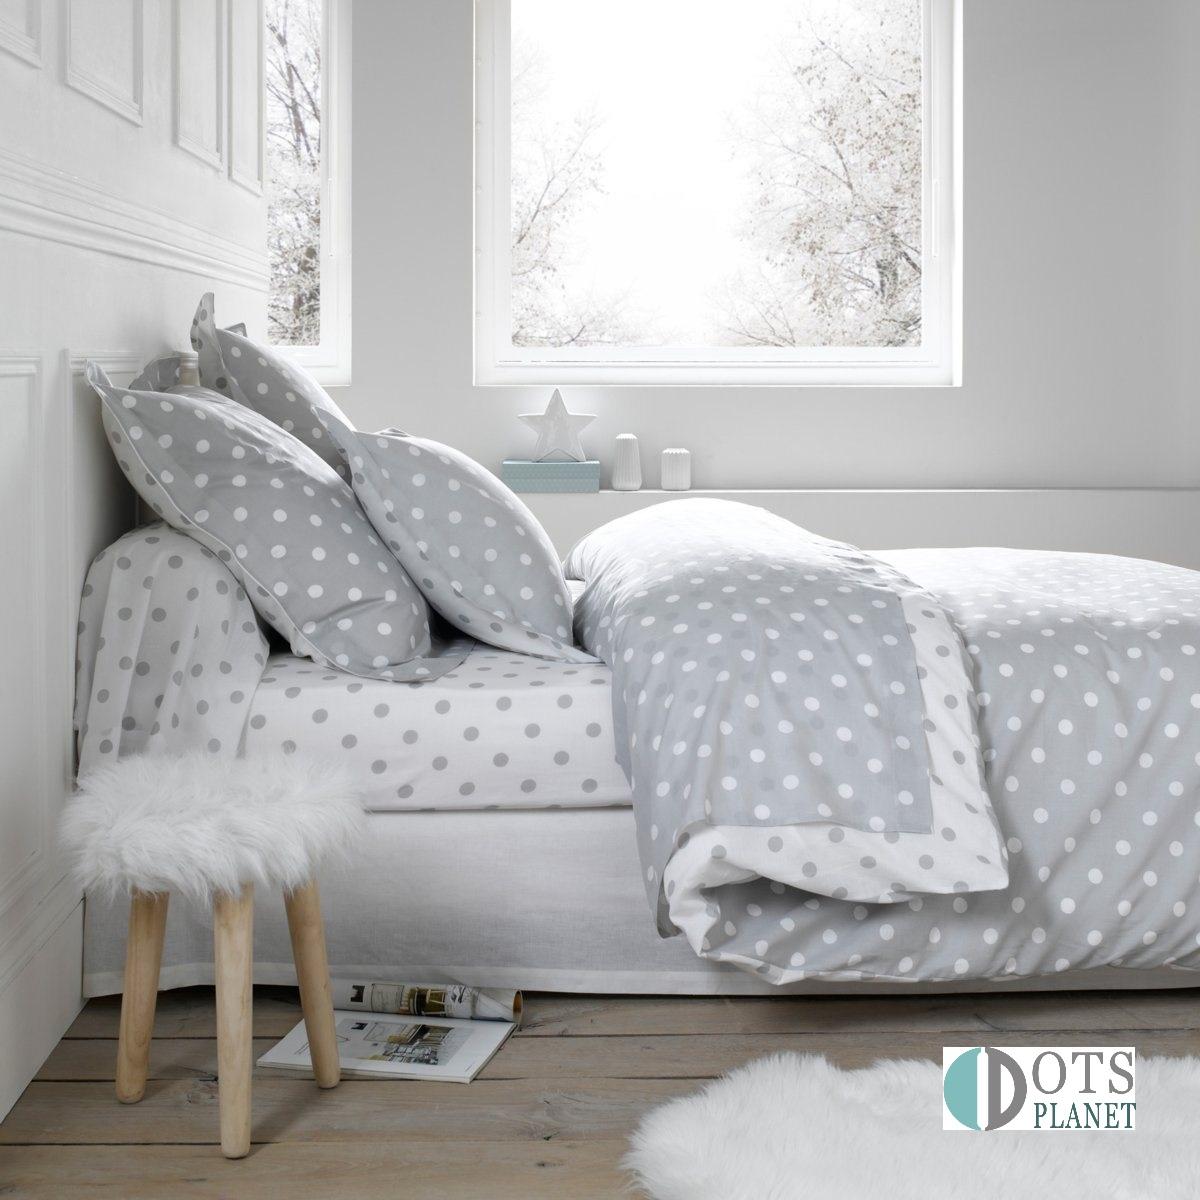 po ciel szare groszki kropki 200x200 dotsplanet. Black Bedroom Furniture Sets. Home Design Ideas